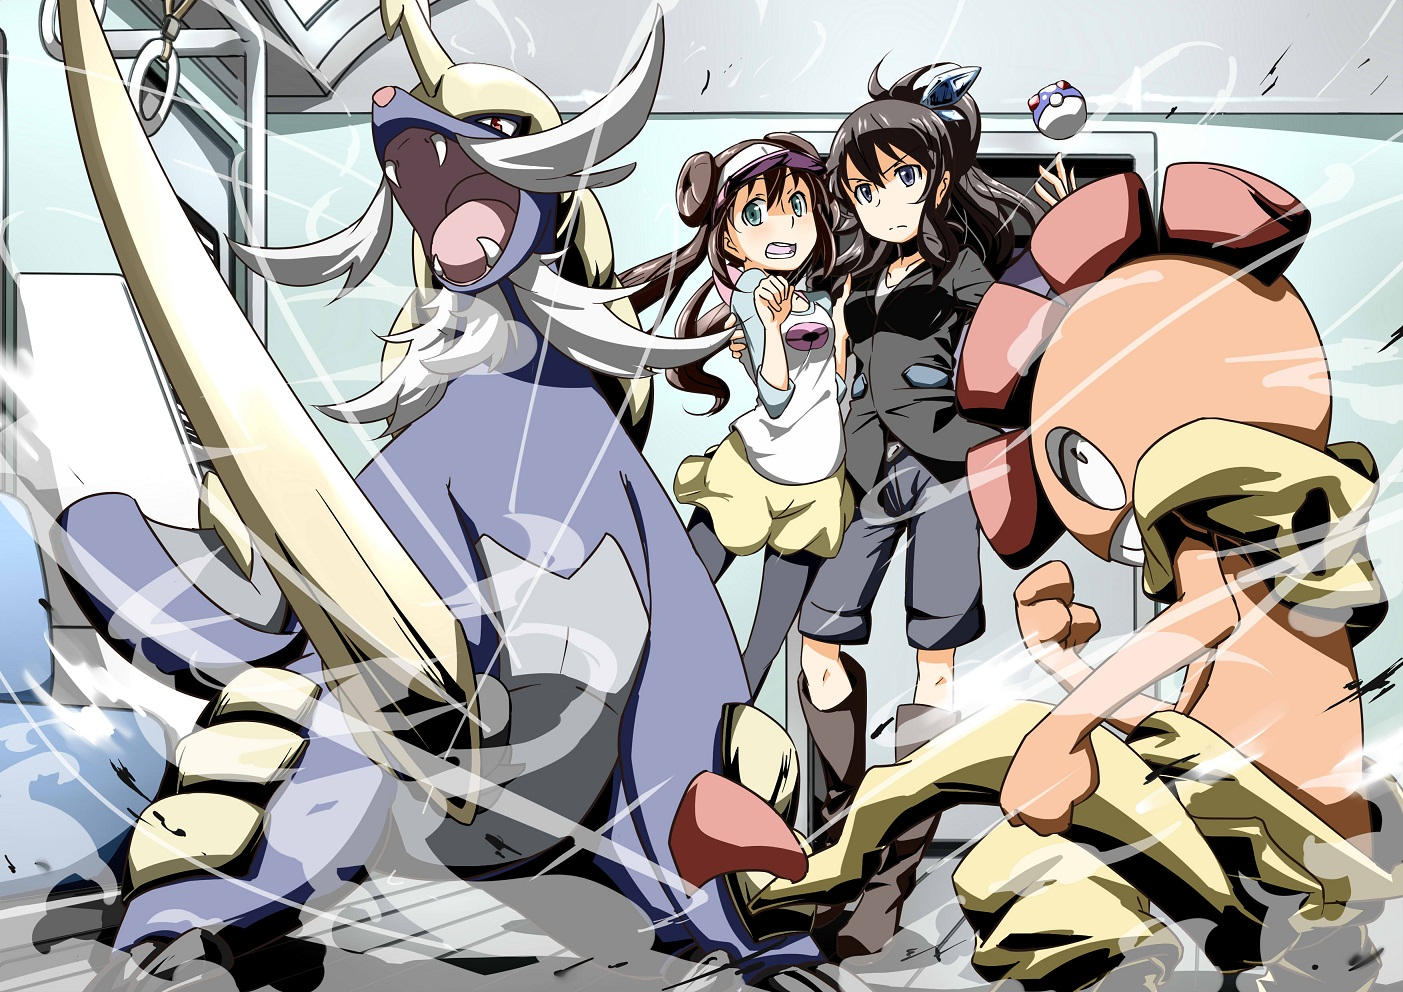 Tags: Pokémon, Touko (Pokémon), Samurott, Scrafty, Mei (Pokémon), Pixiv Id 28037509, Yuuichi (Reductionblack)